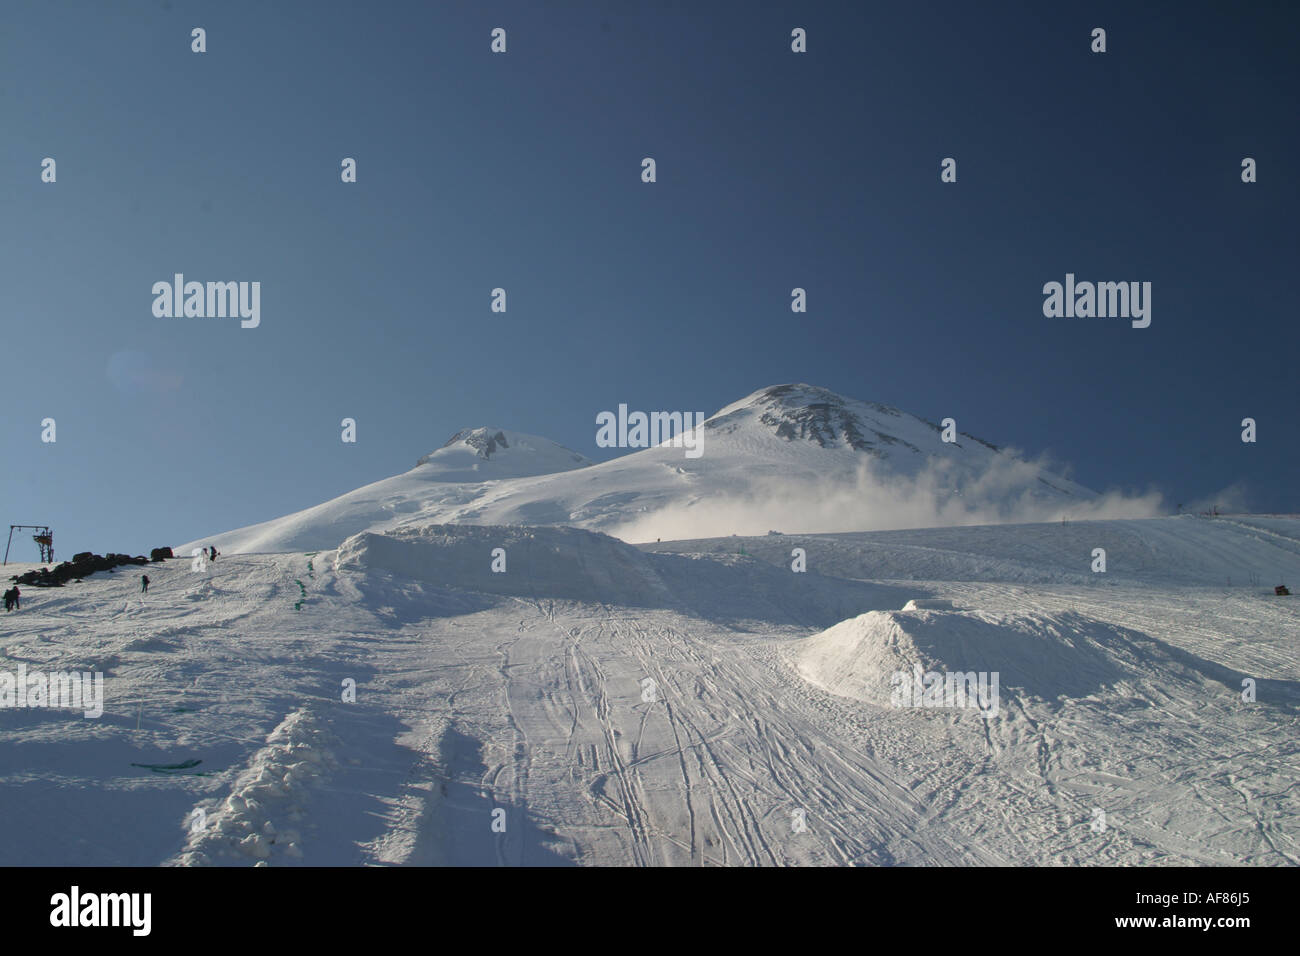 Mountains landscape 21 - Evening Elbrus in pure blue sky and snowboard big-airs, Caucasus, Elbrus region, Kabardino-Balkari - Stock Image